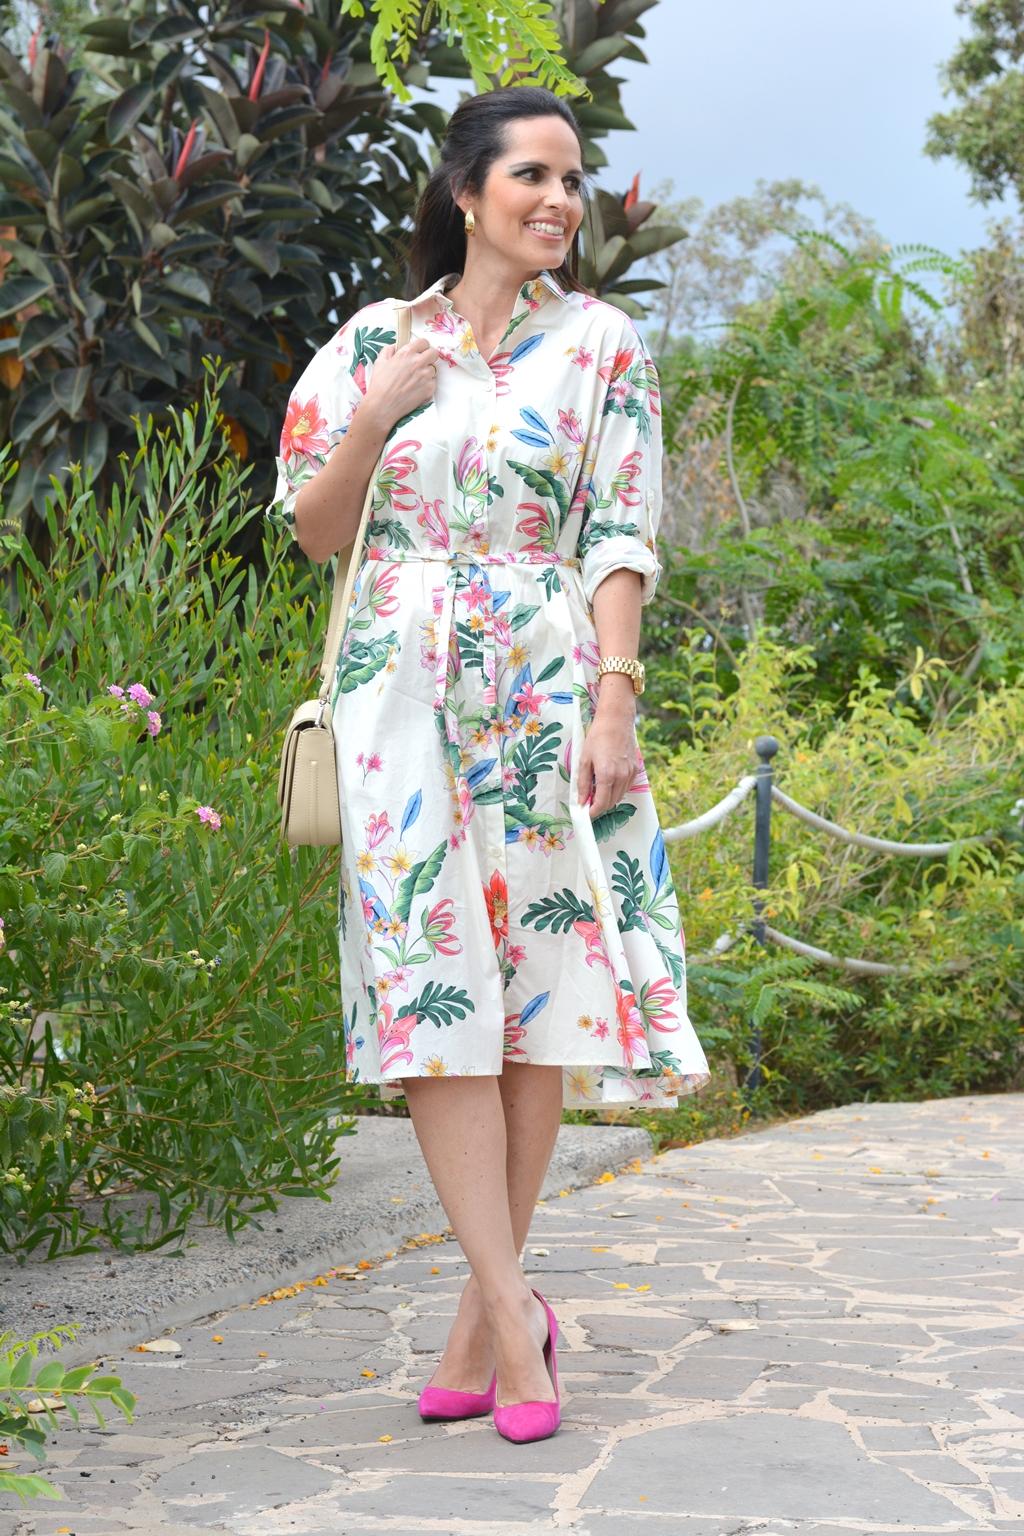 outfit-zara-dress-flowers-daily-looks